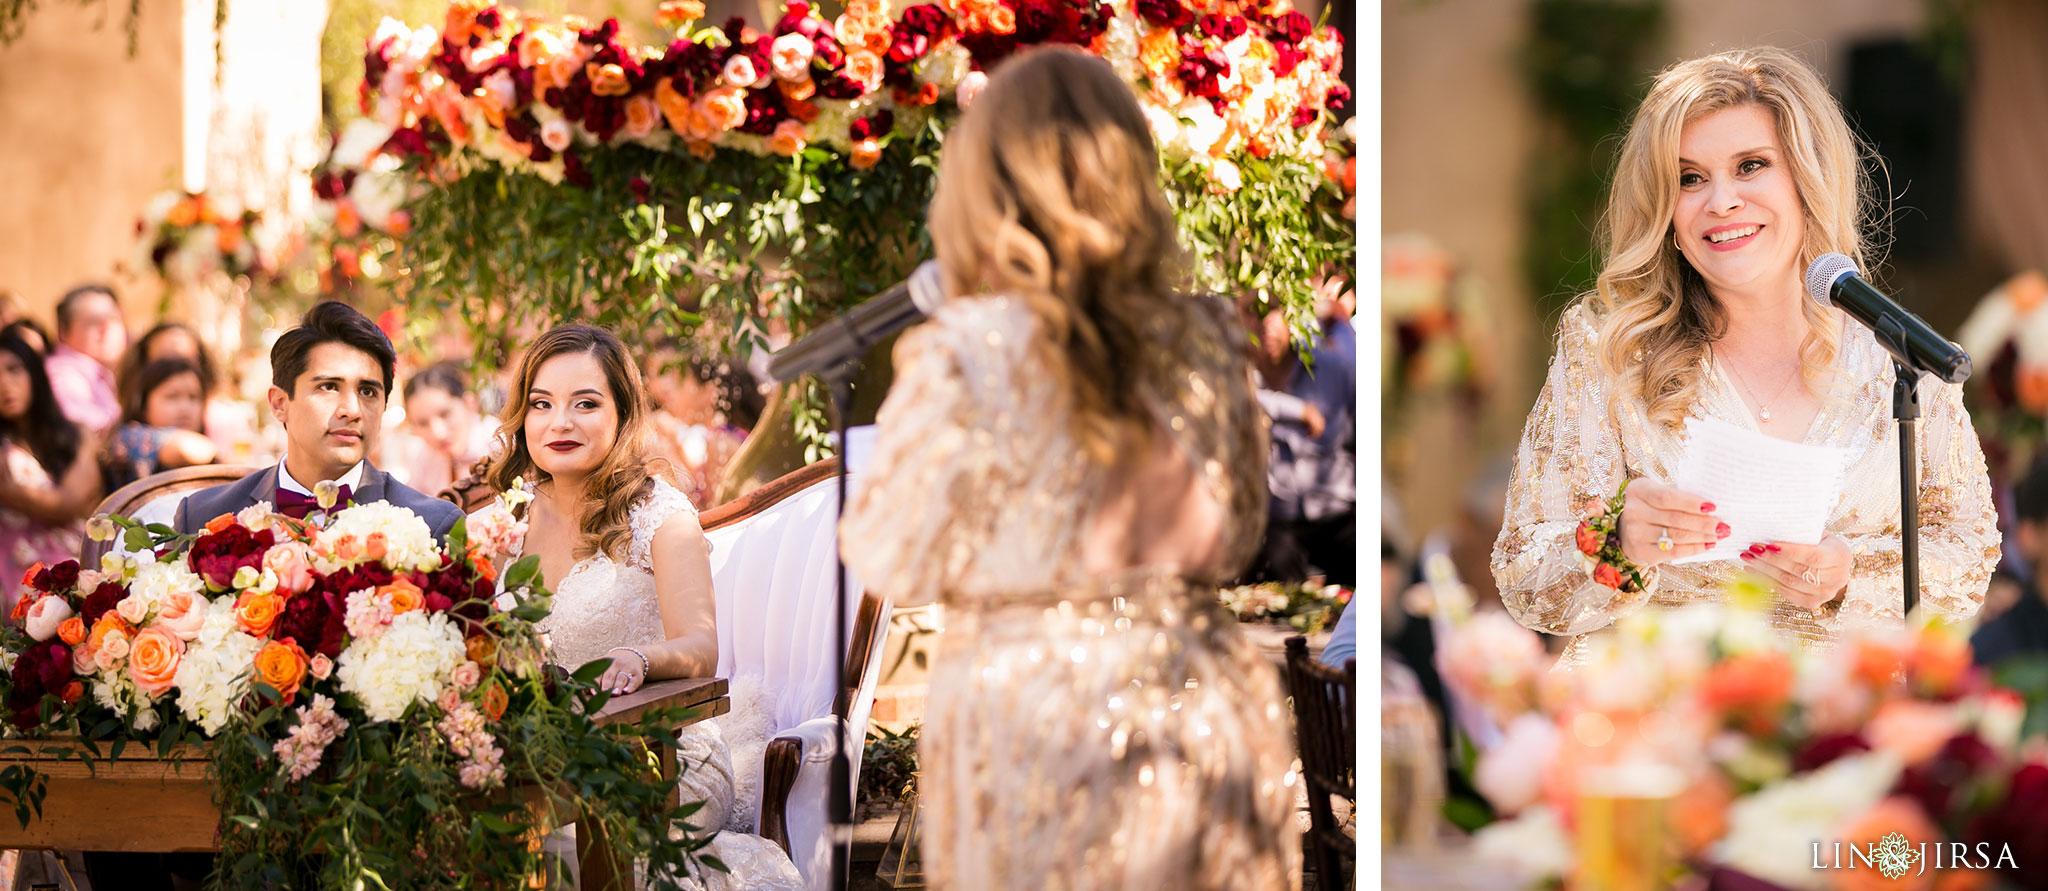 35 serra plaza san juan capistrano wedding ceremony photography